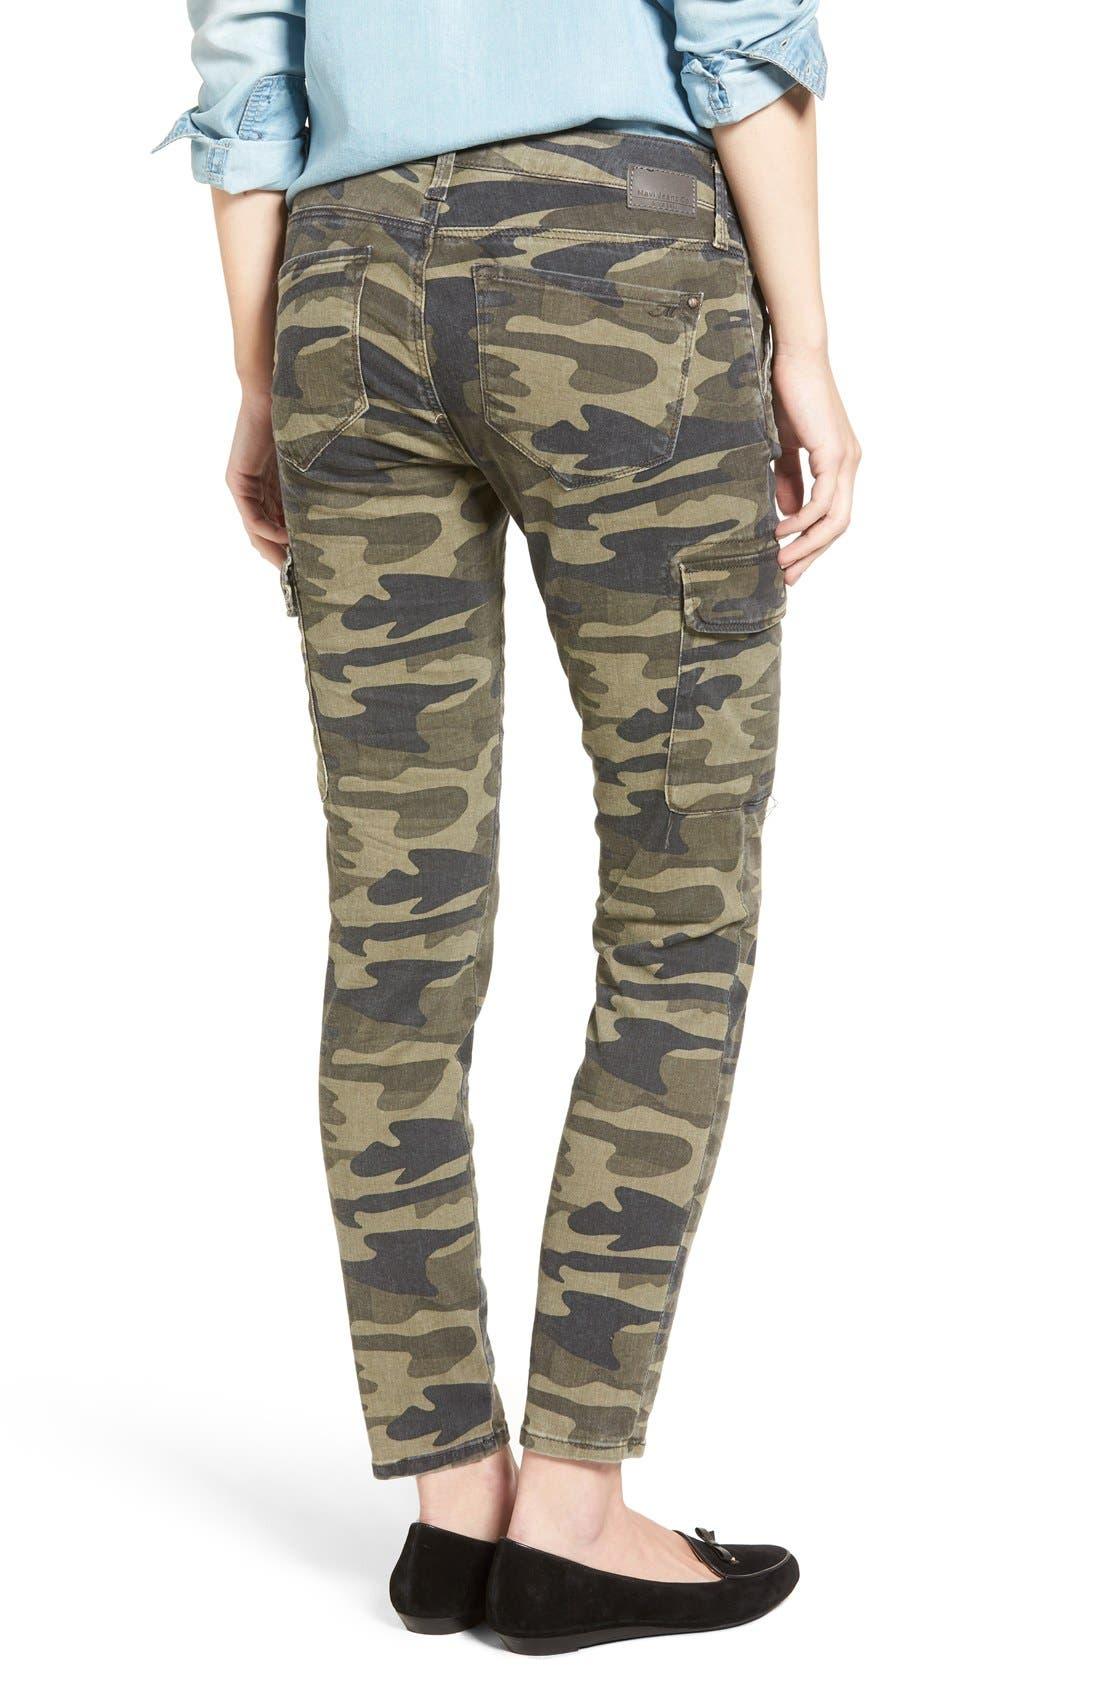 f325ddd56e6 Women s Camouflage Cropped   Capri Pants